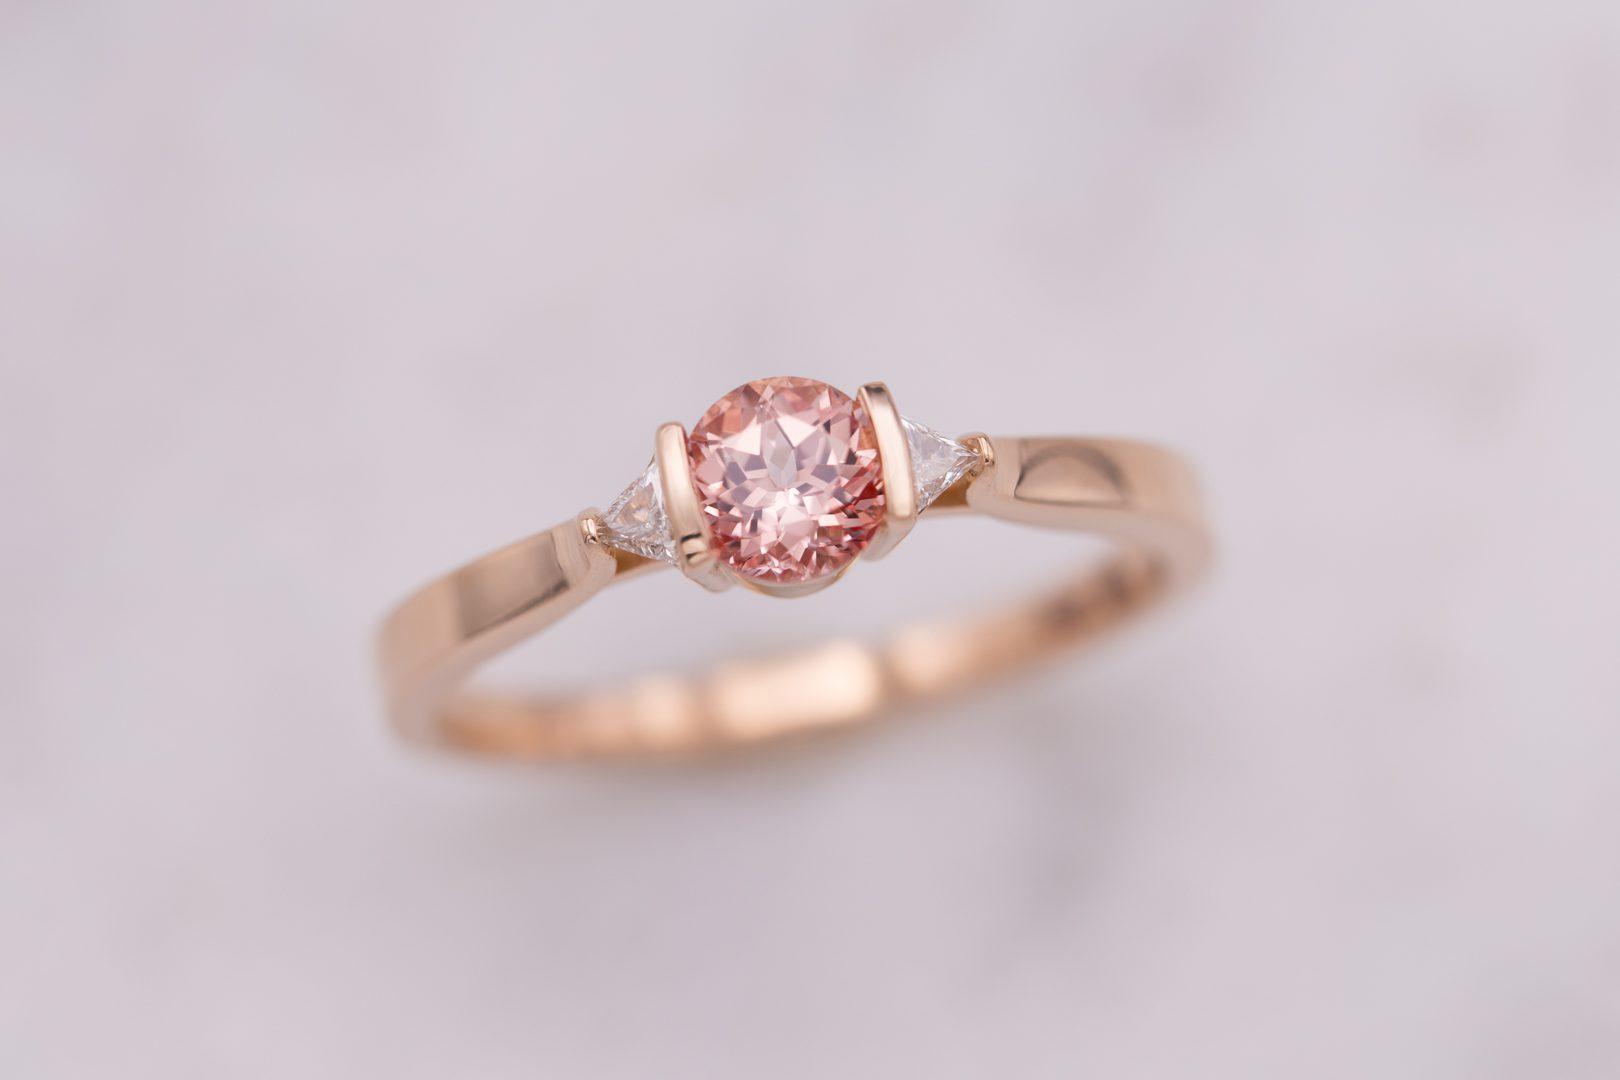 bar-set champagne sapphire three stone - engagement ring setting